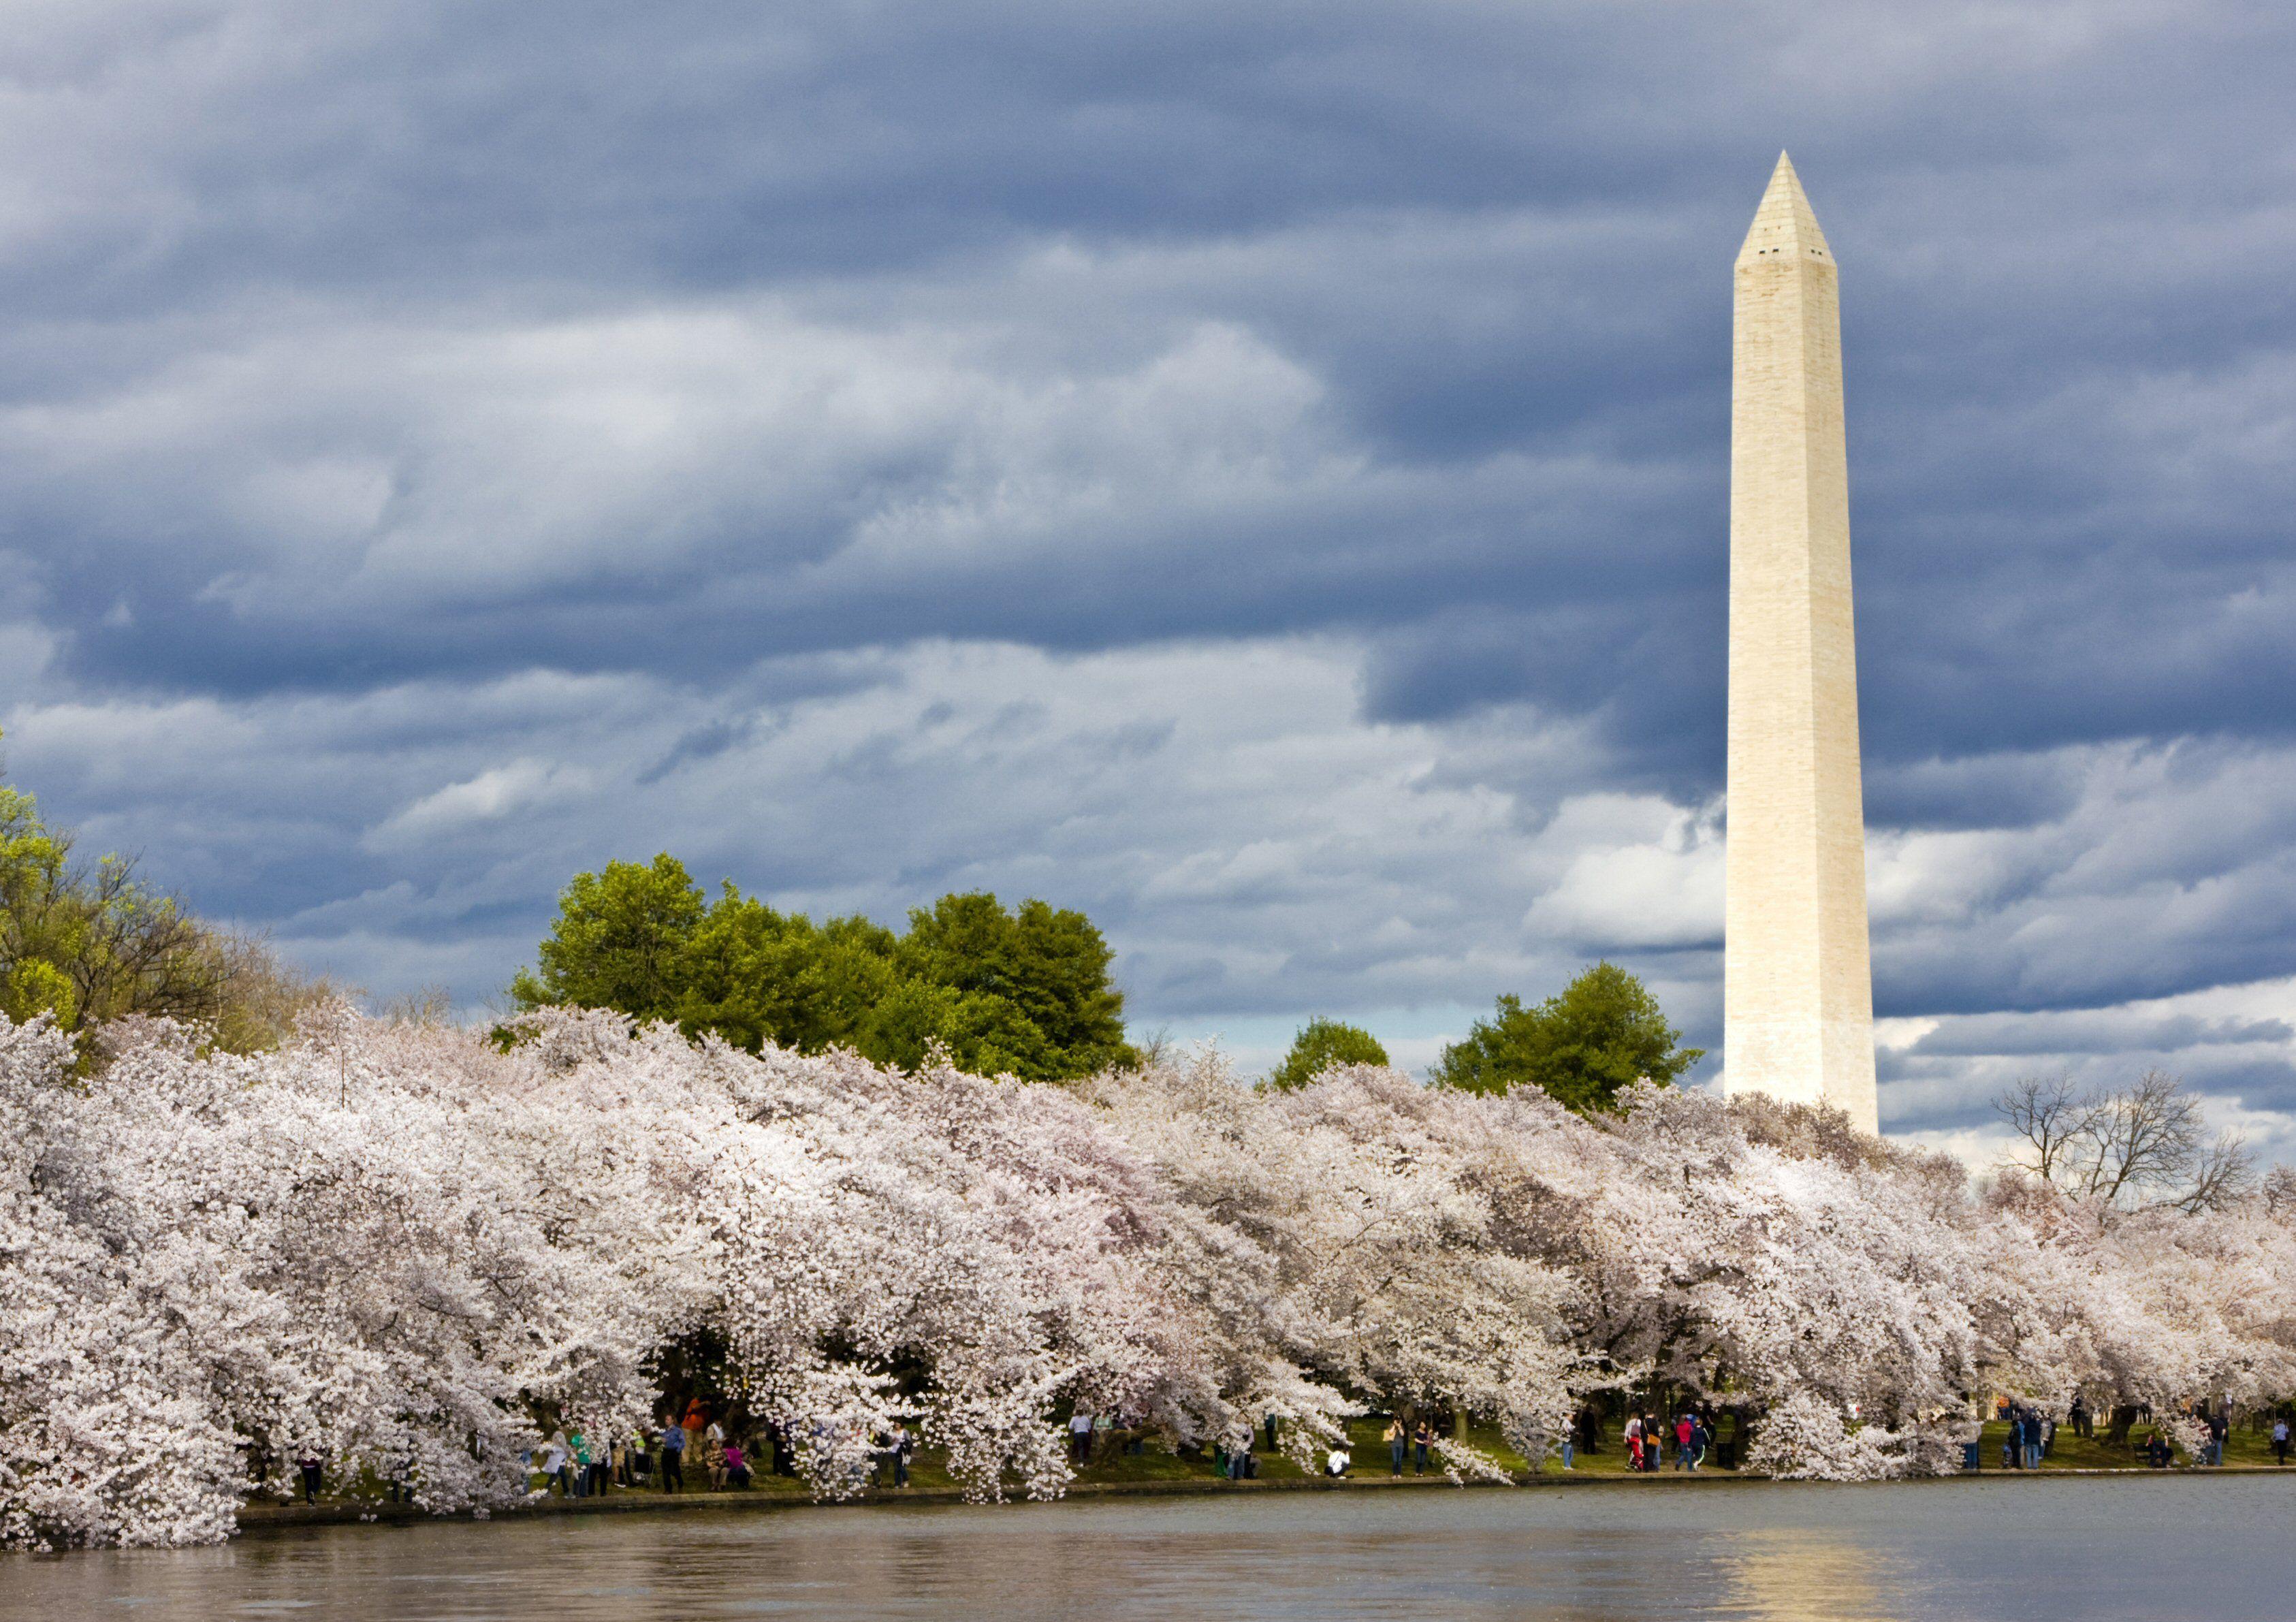 Washington Monument and Cherry Blossoms around Tidal Basin, Washington, DC